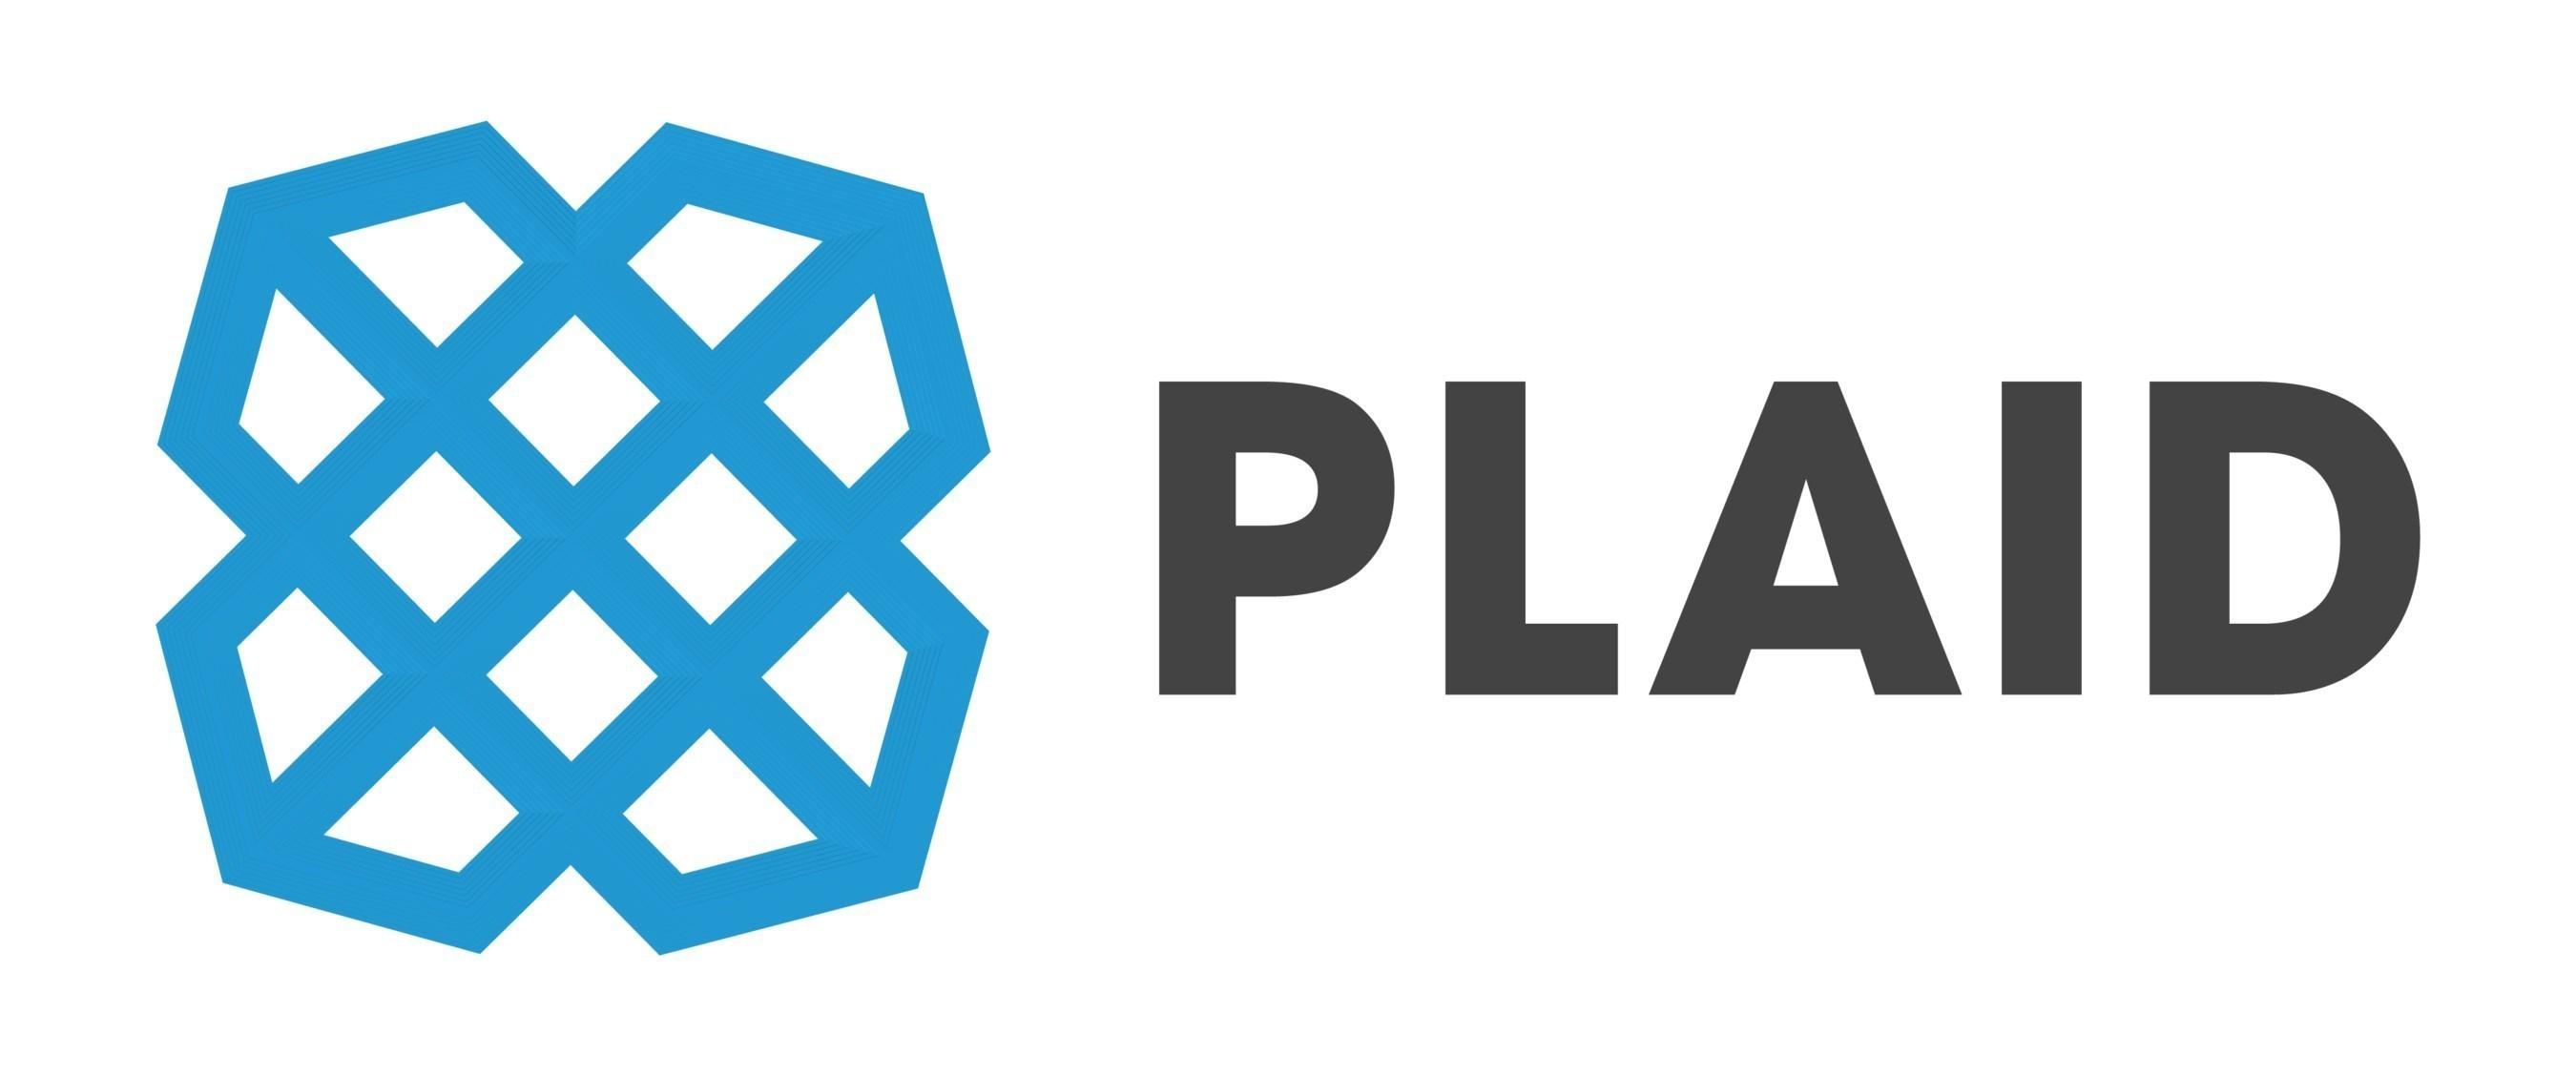 Plaid announces $44 million Series B led by Goldman Sachs Investment  Partners